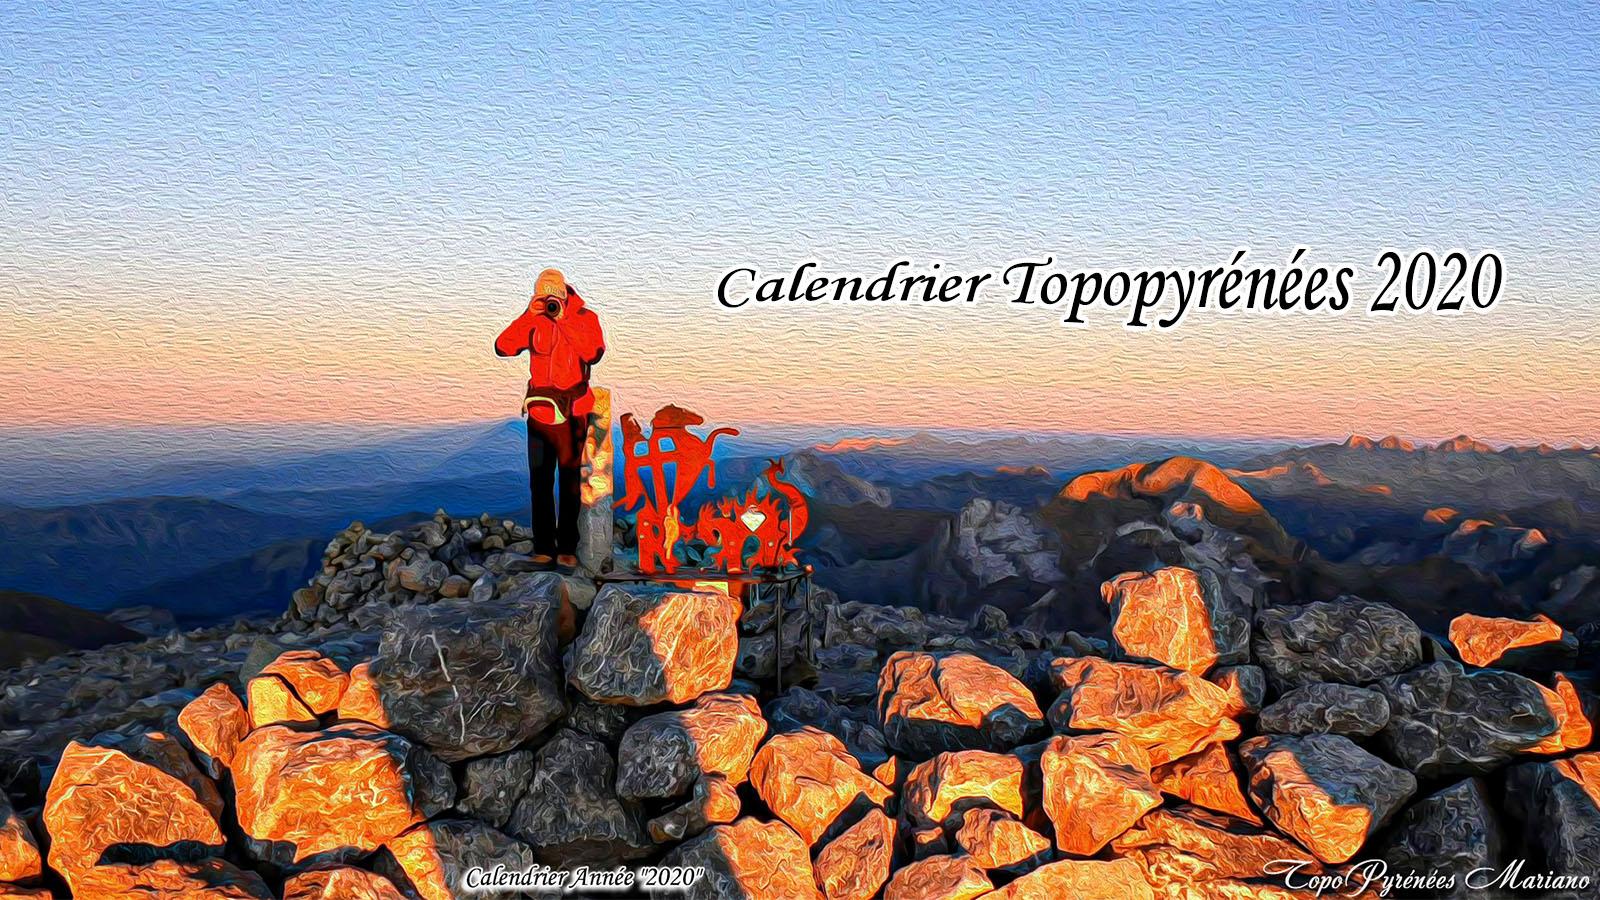 Calendrier TopoPyrénées Année 2020